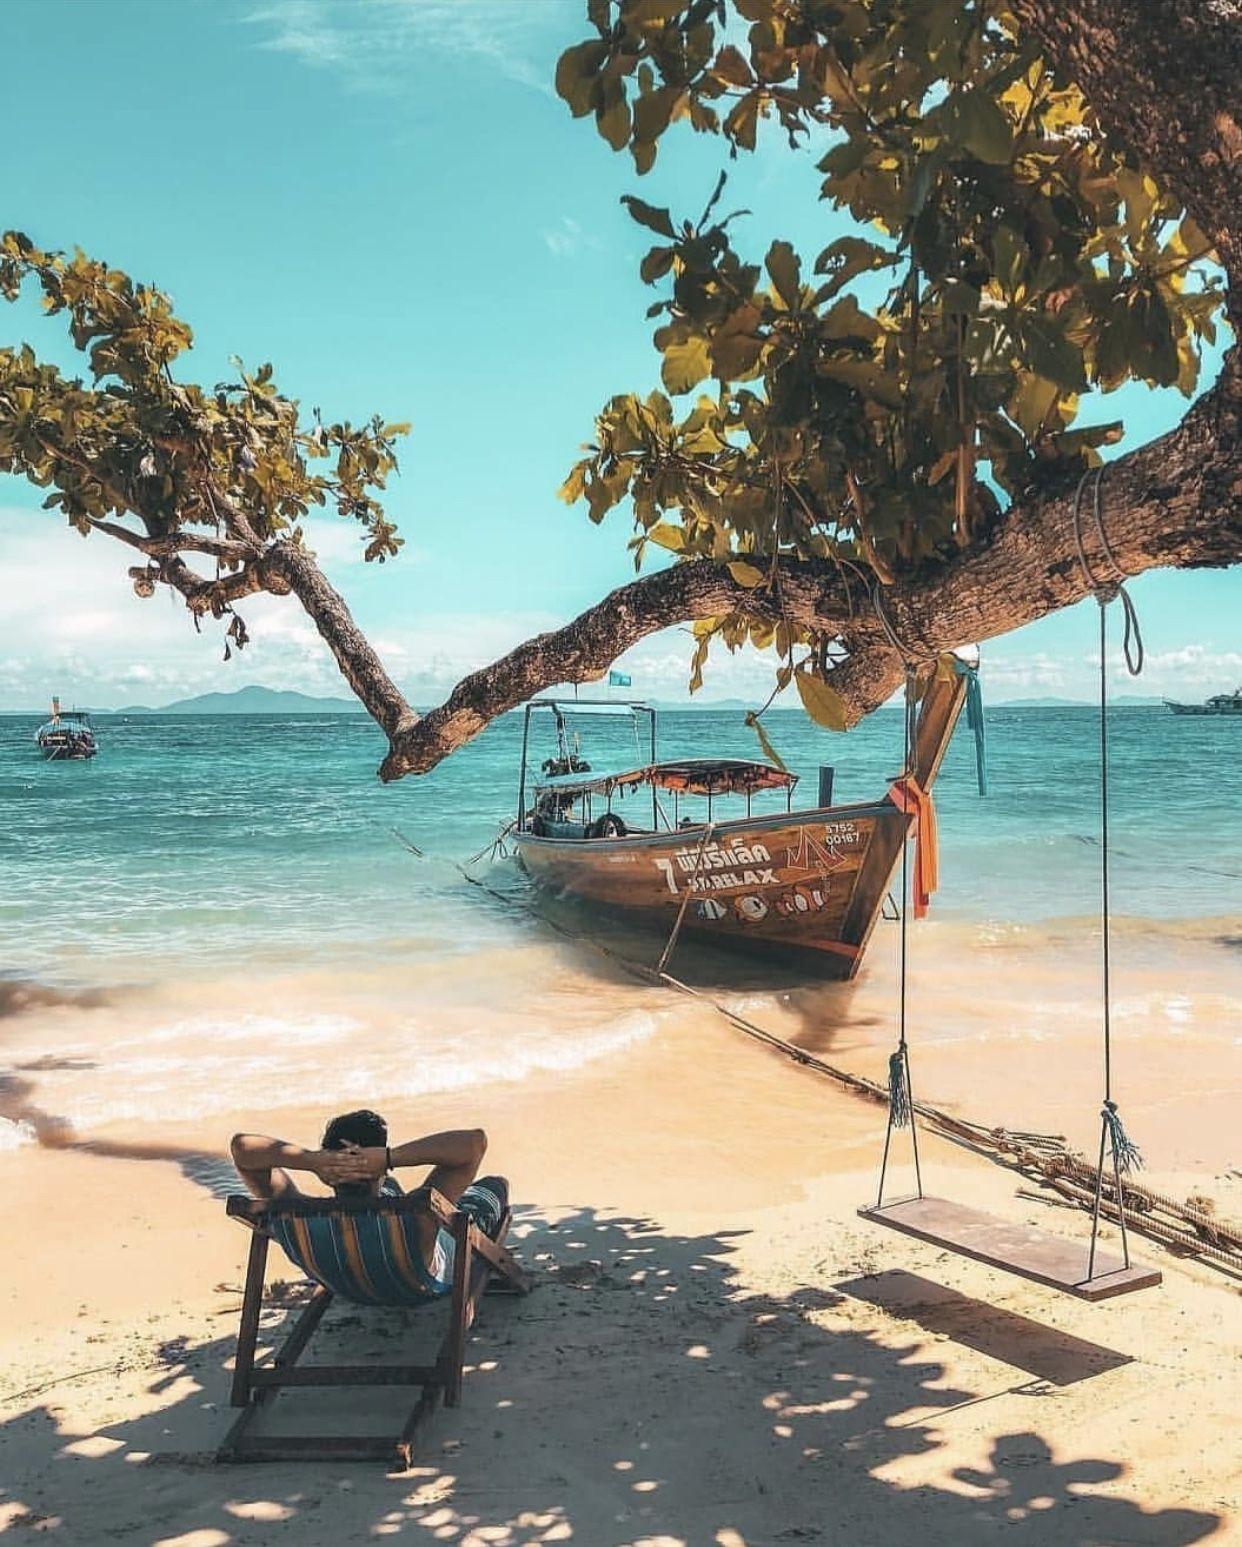 тайланд картинки инстаграм портьеры придадут